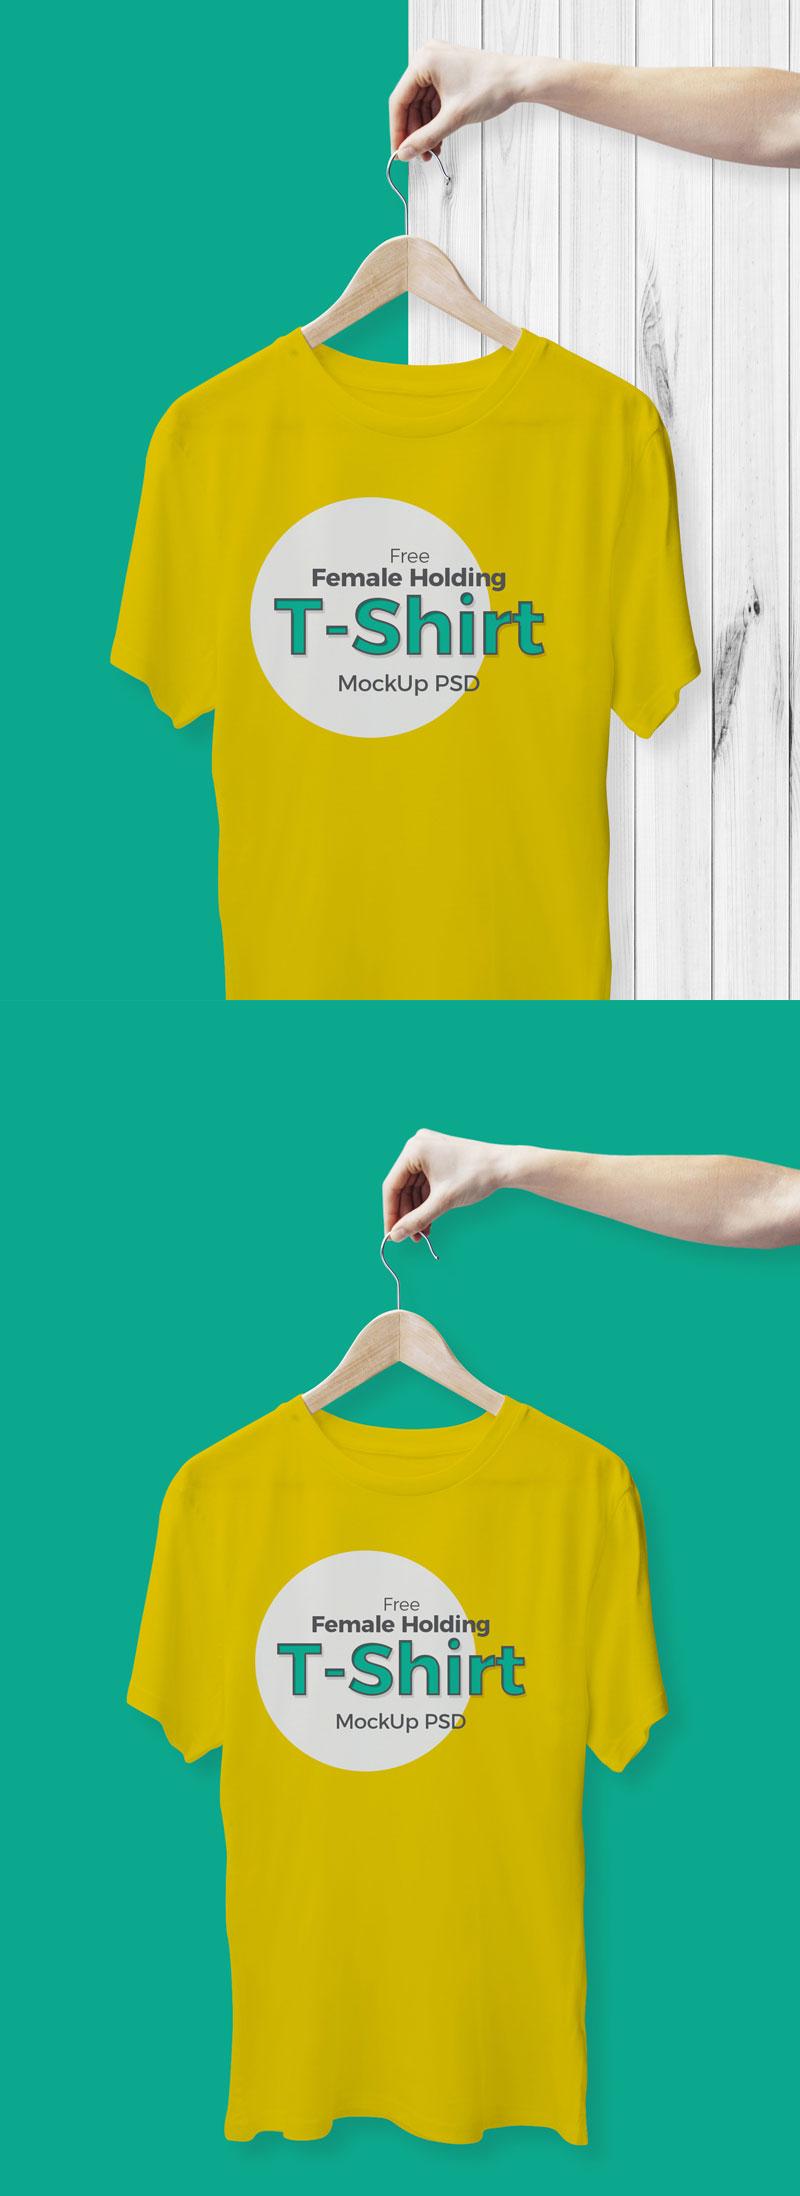 Free-Female-Holding-T-Shirt-Mockup-PSD